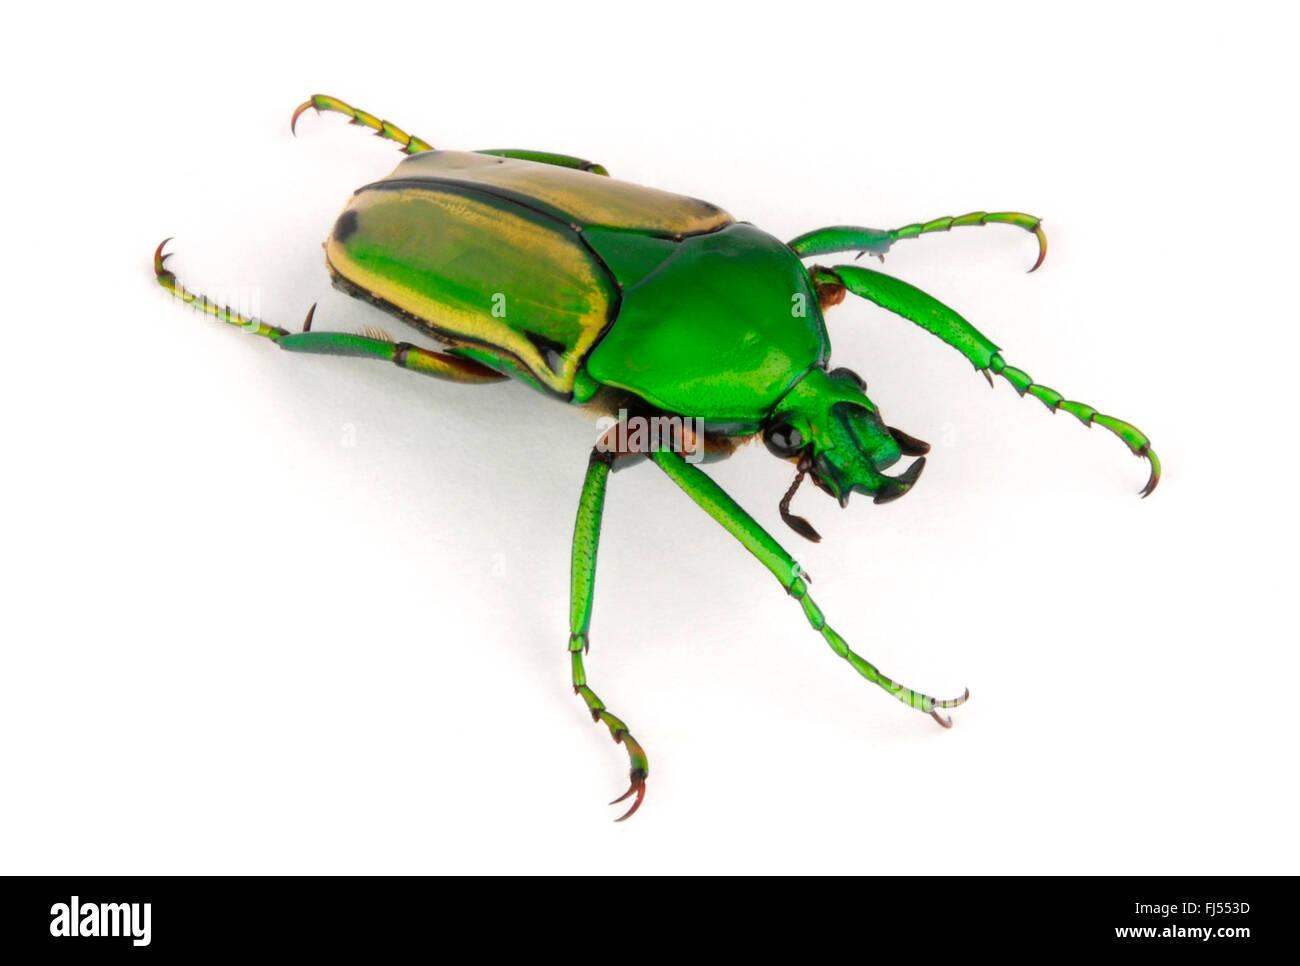 rose beetle; rose chafer (Eudicella aurata, Cyprolais aurata), cut-out, Cameroon - Stock Image